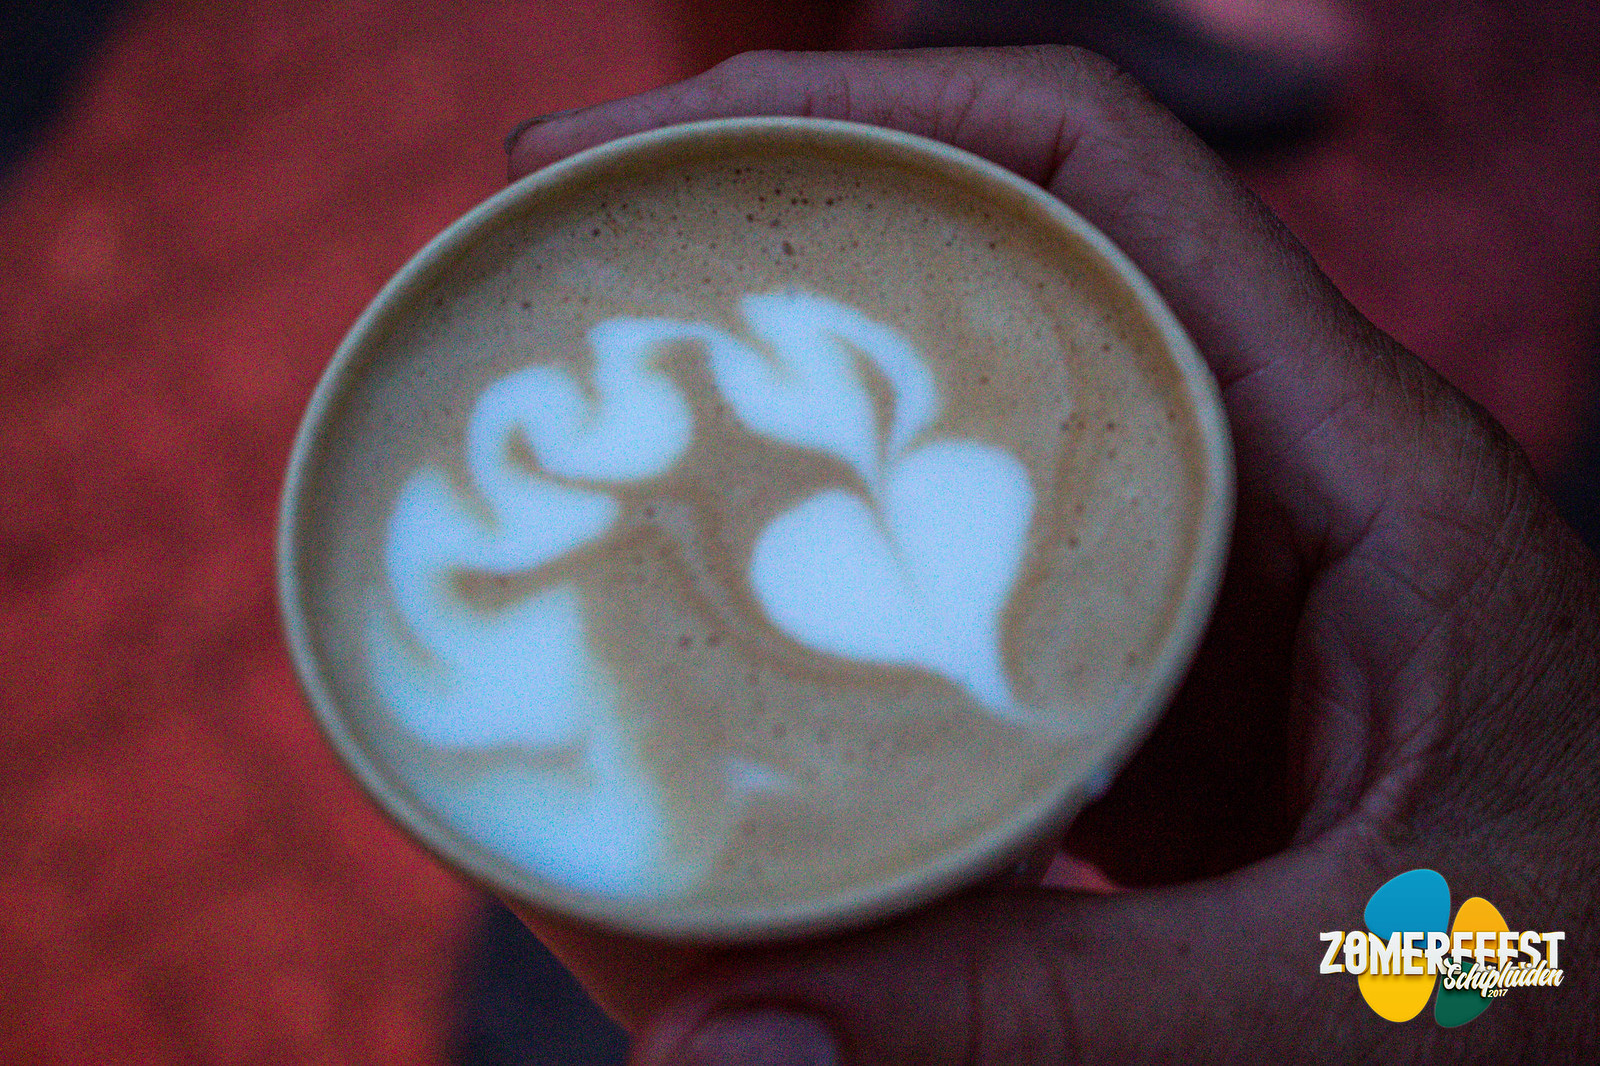 Cafedewereld-60